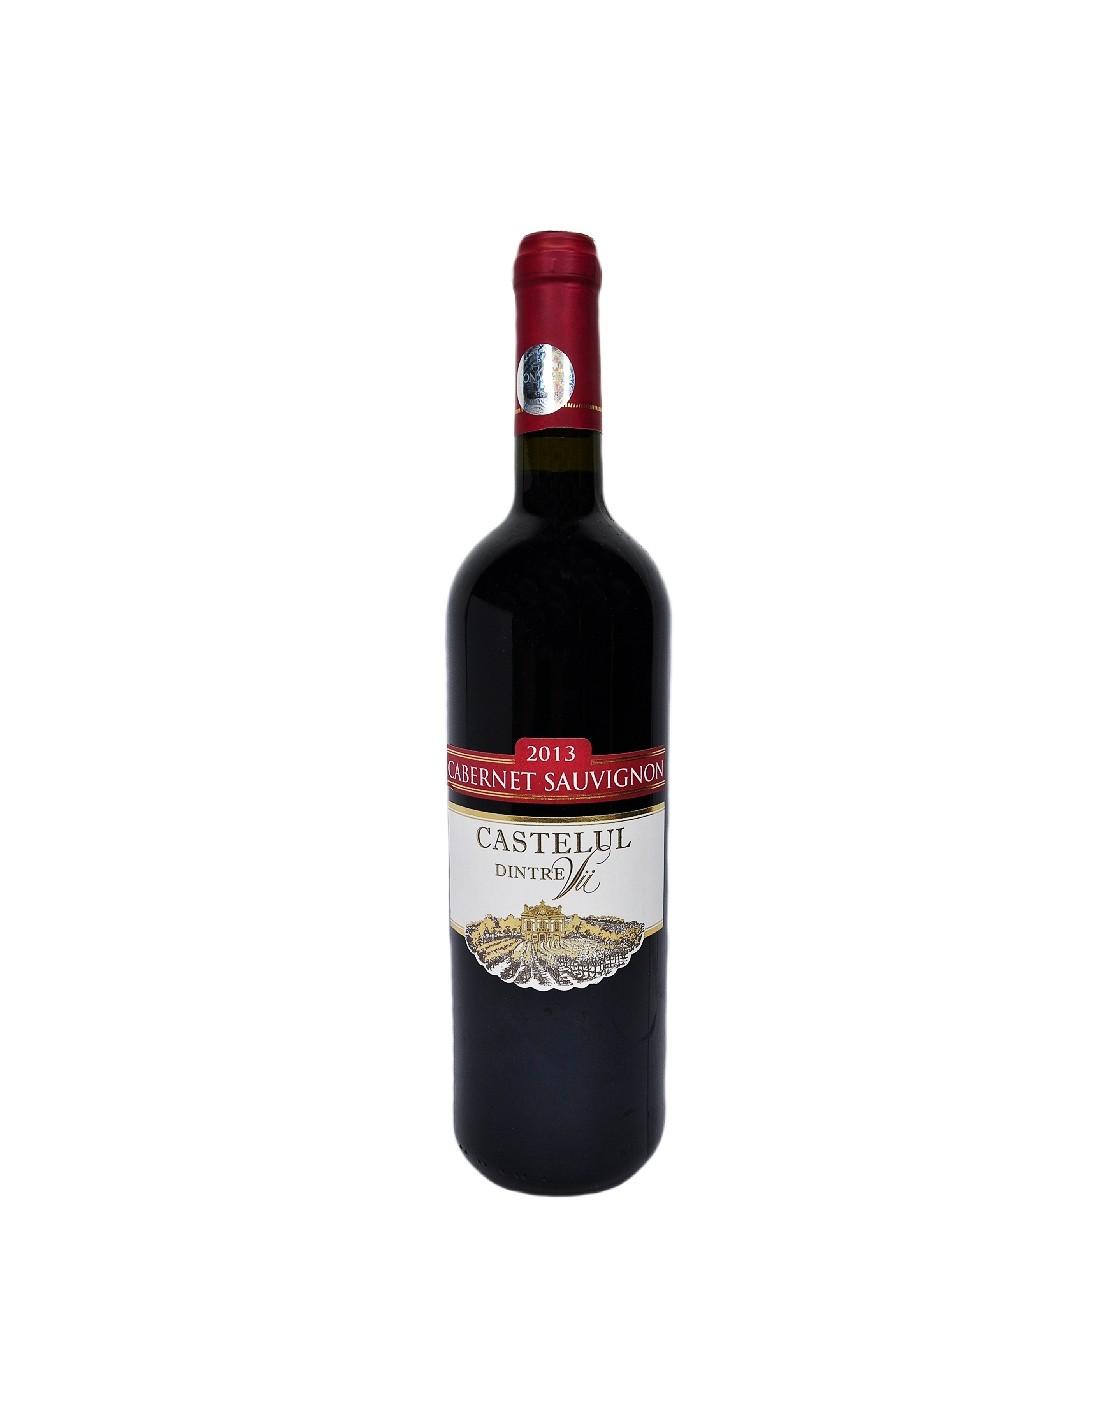 Vin rosu sec, Cabernet Sauvignon, Castelul dintre Vii, 0.75, 11.5% alc., Republica Moldova